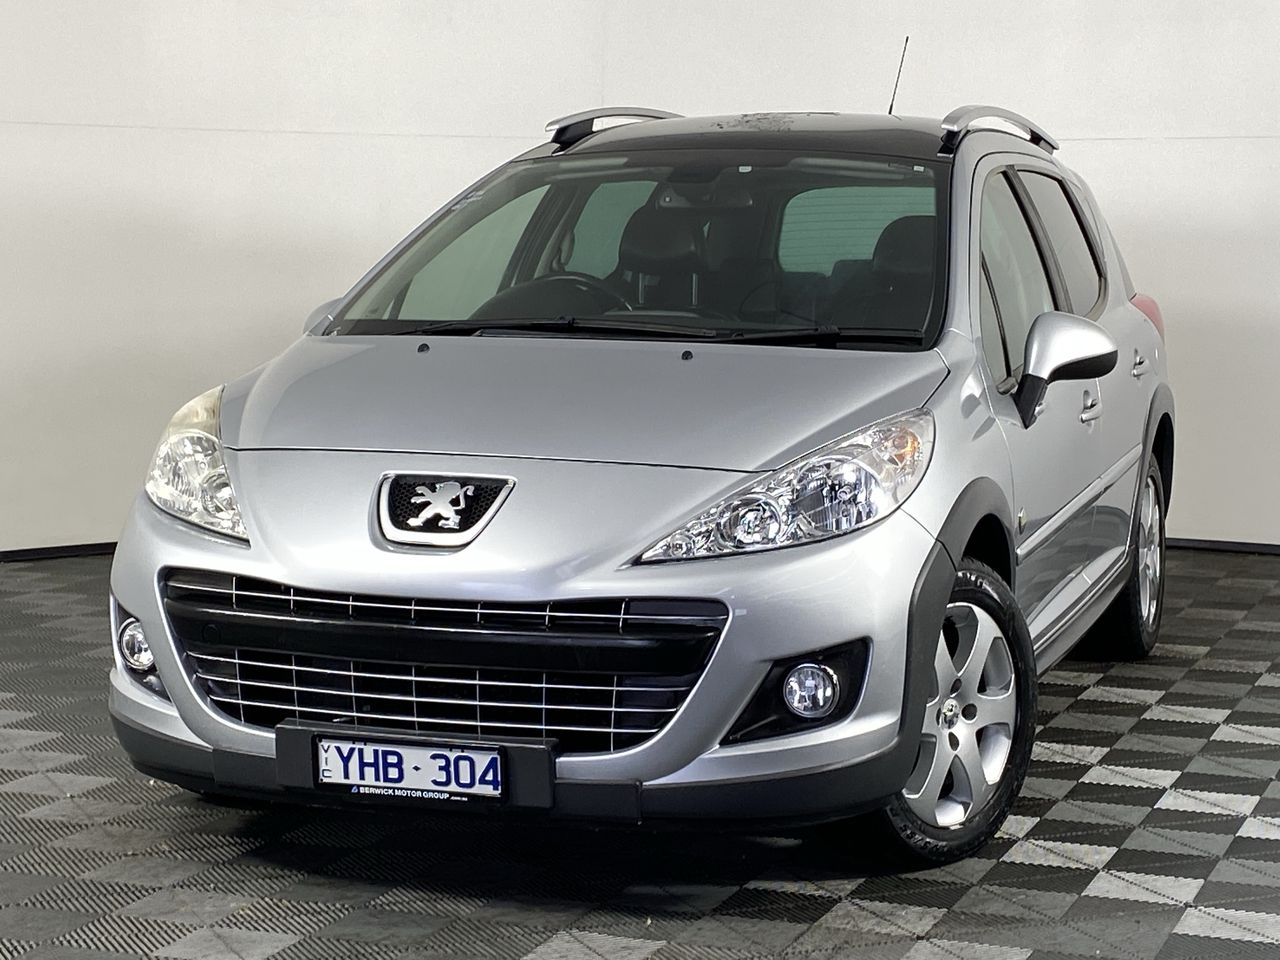 2011 Peugeot 207 XT Touring Automatic Wagon